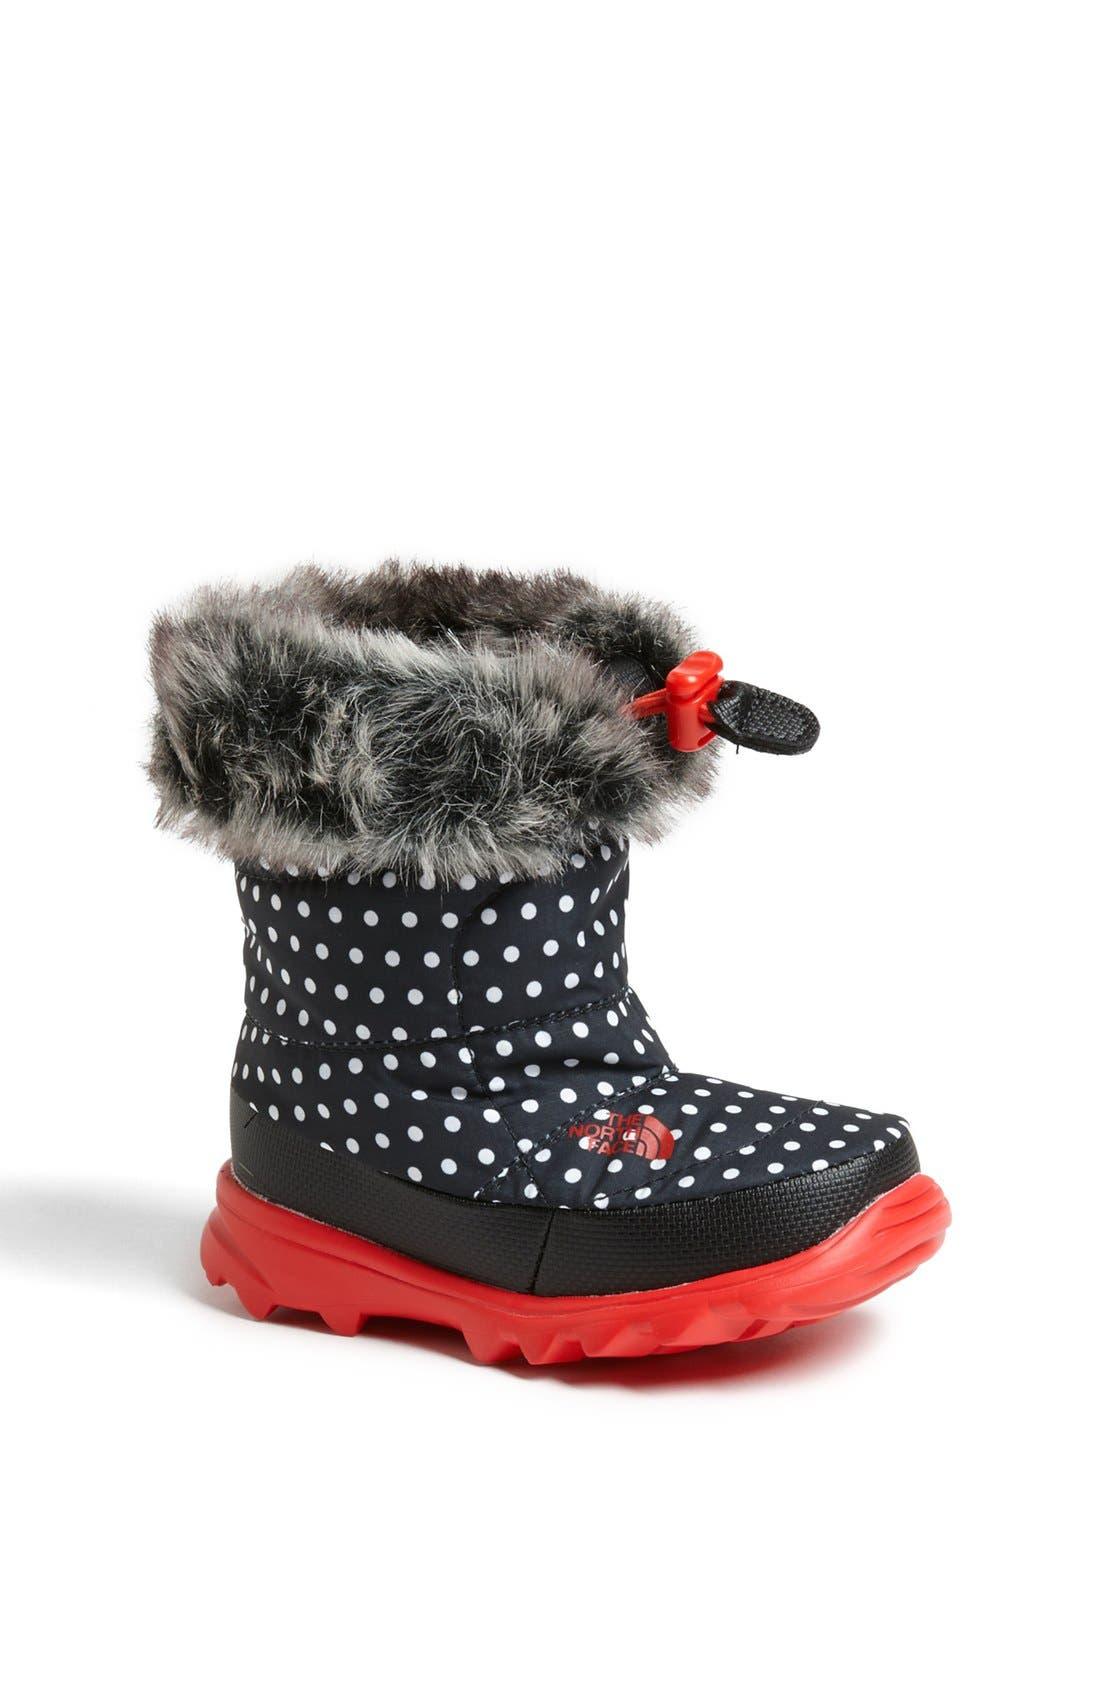 Main Image - The North Face 'Nuptse Fur II' Winter Boot (Walker & Toddler)